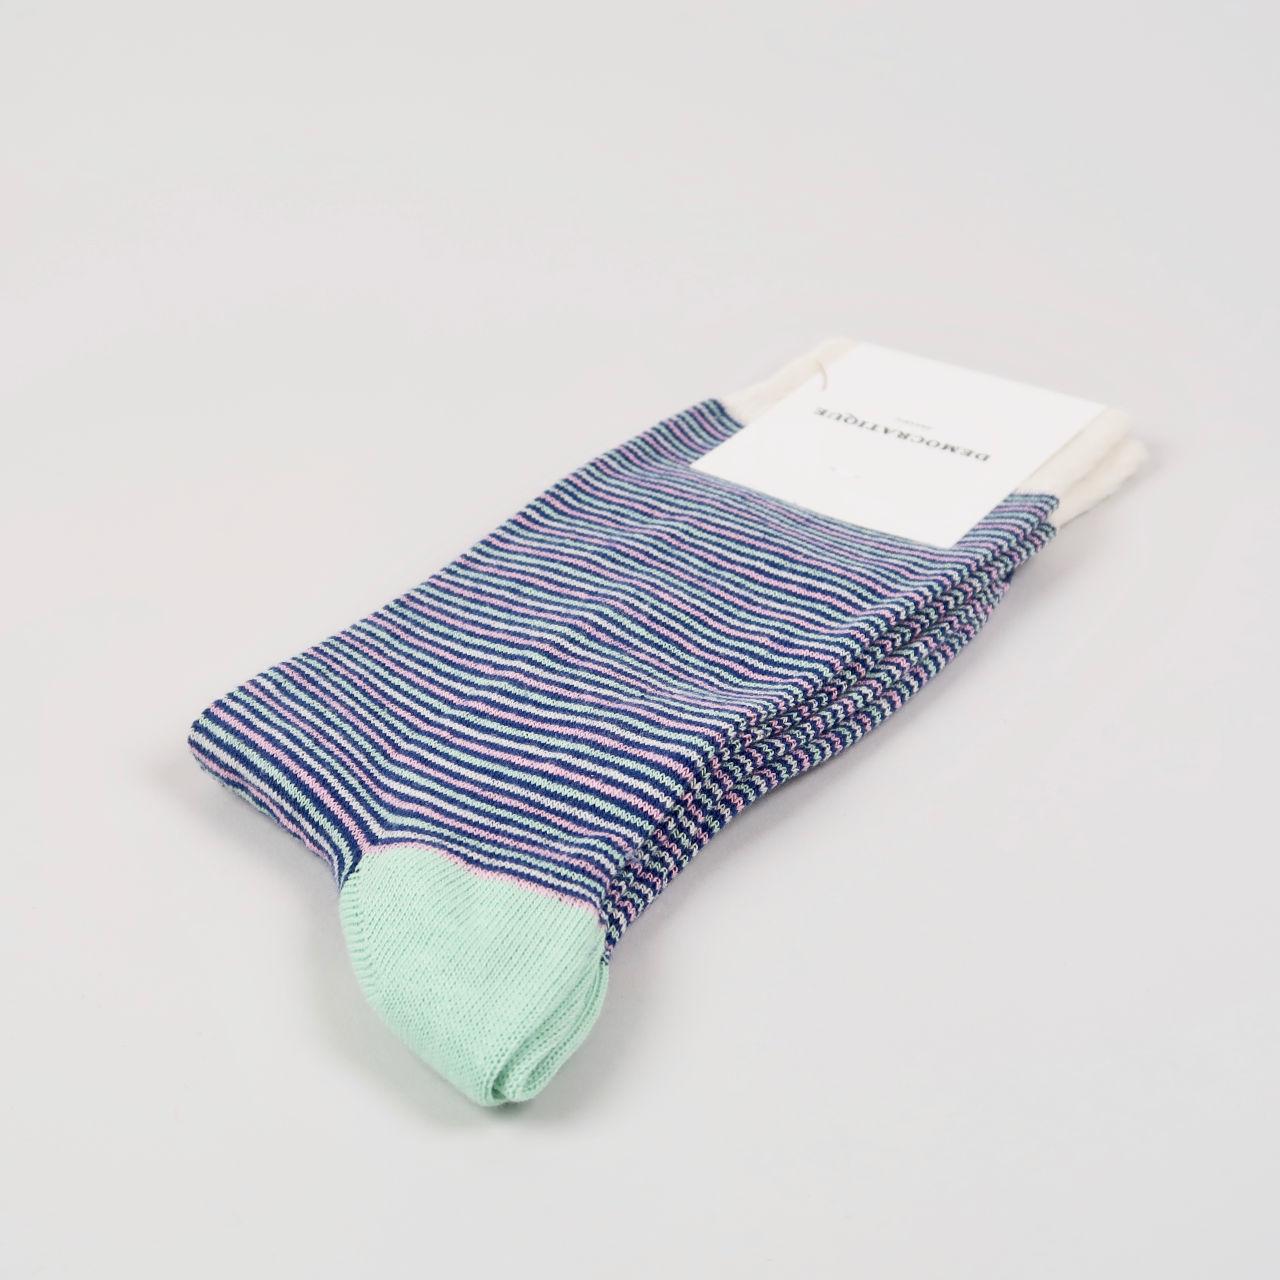 Mens Socks - Ultralight Stripe - New Blue, Off White, Pale Green, Soft Pink